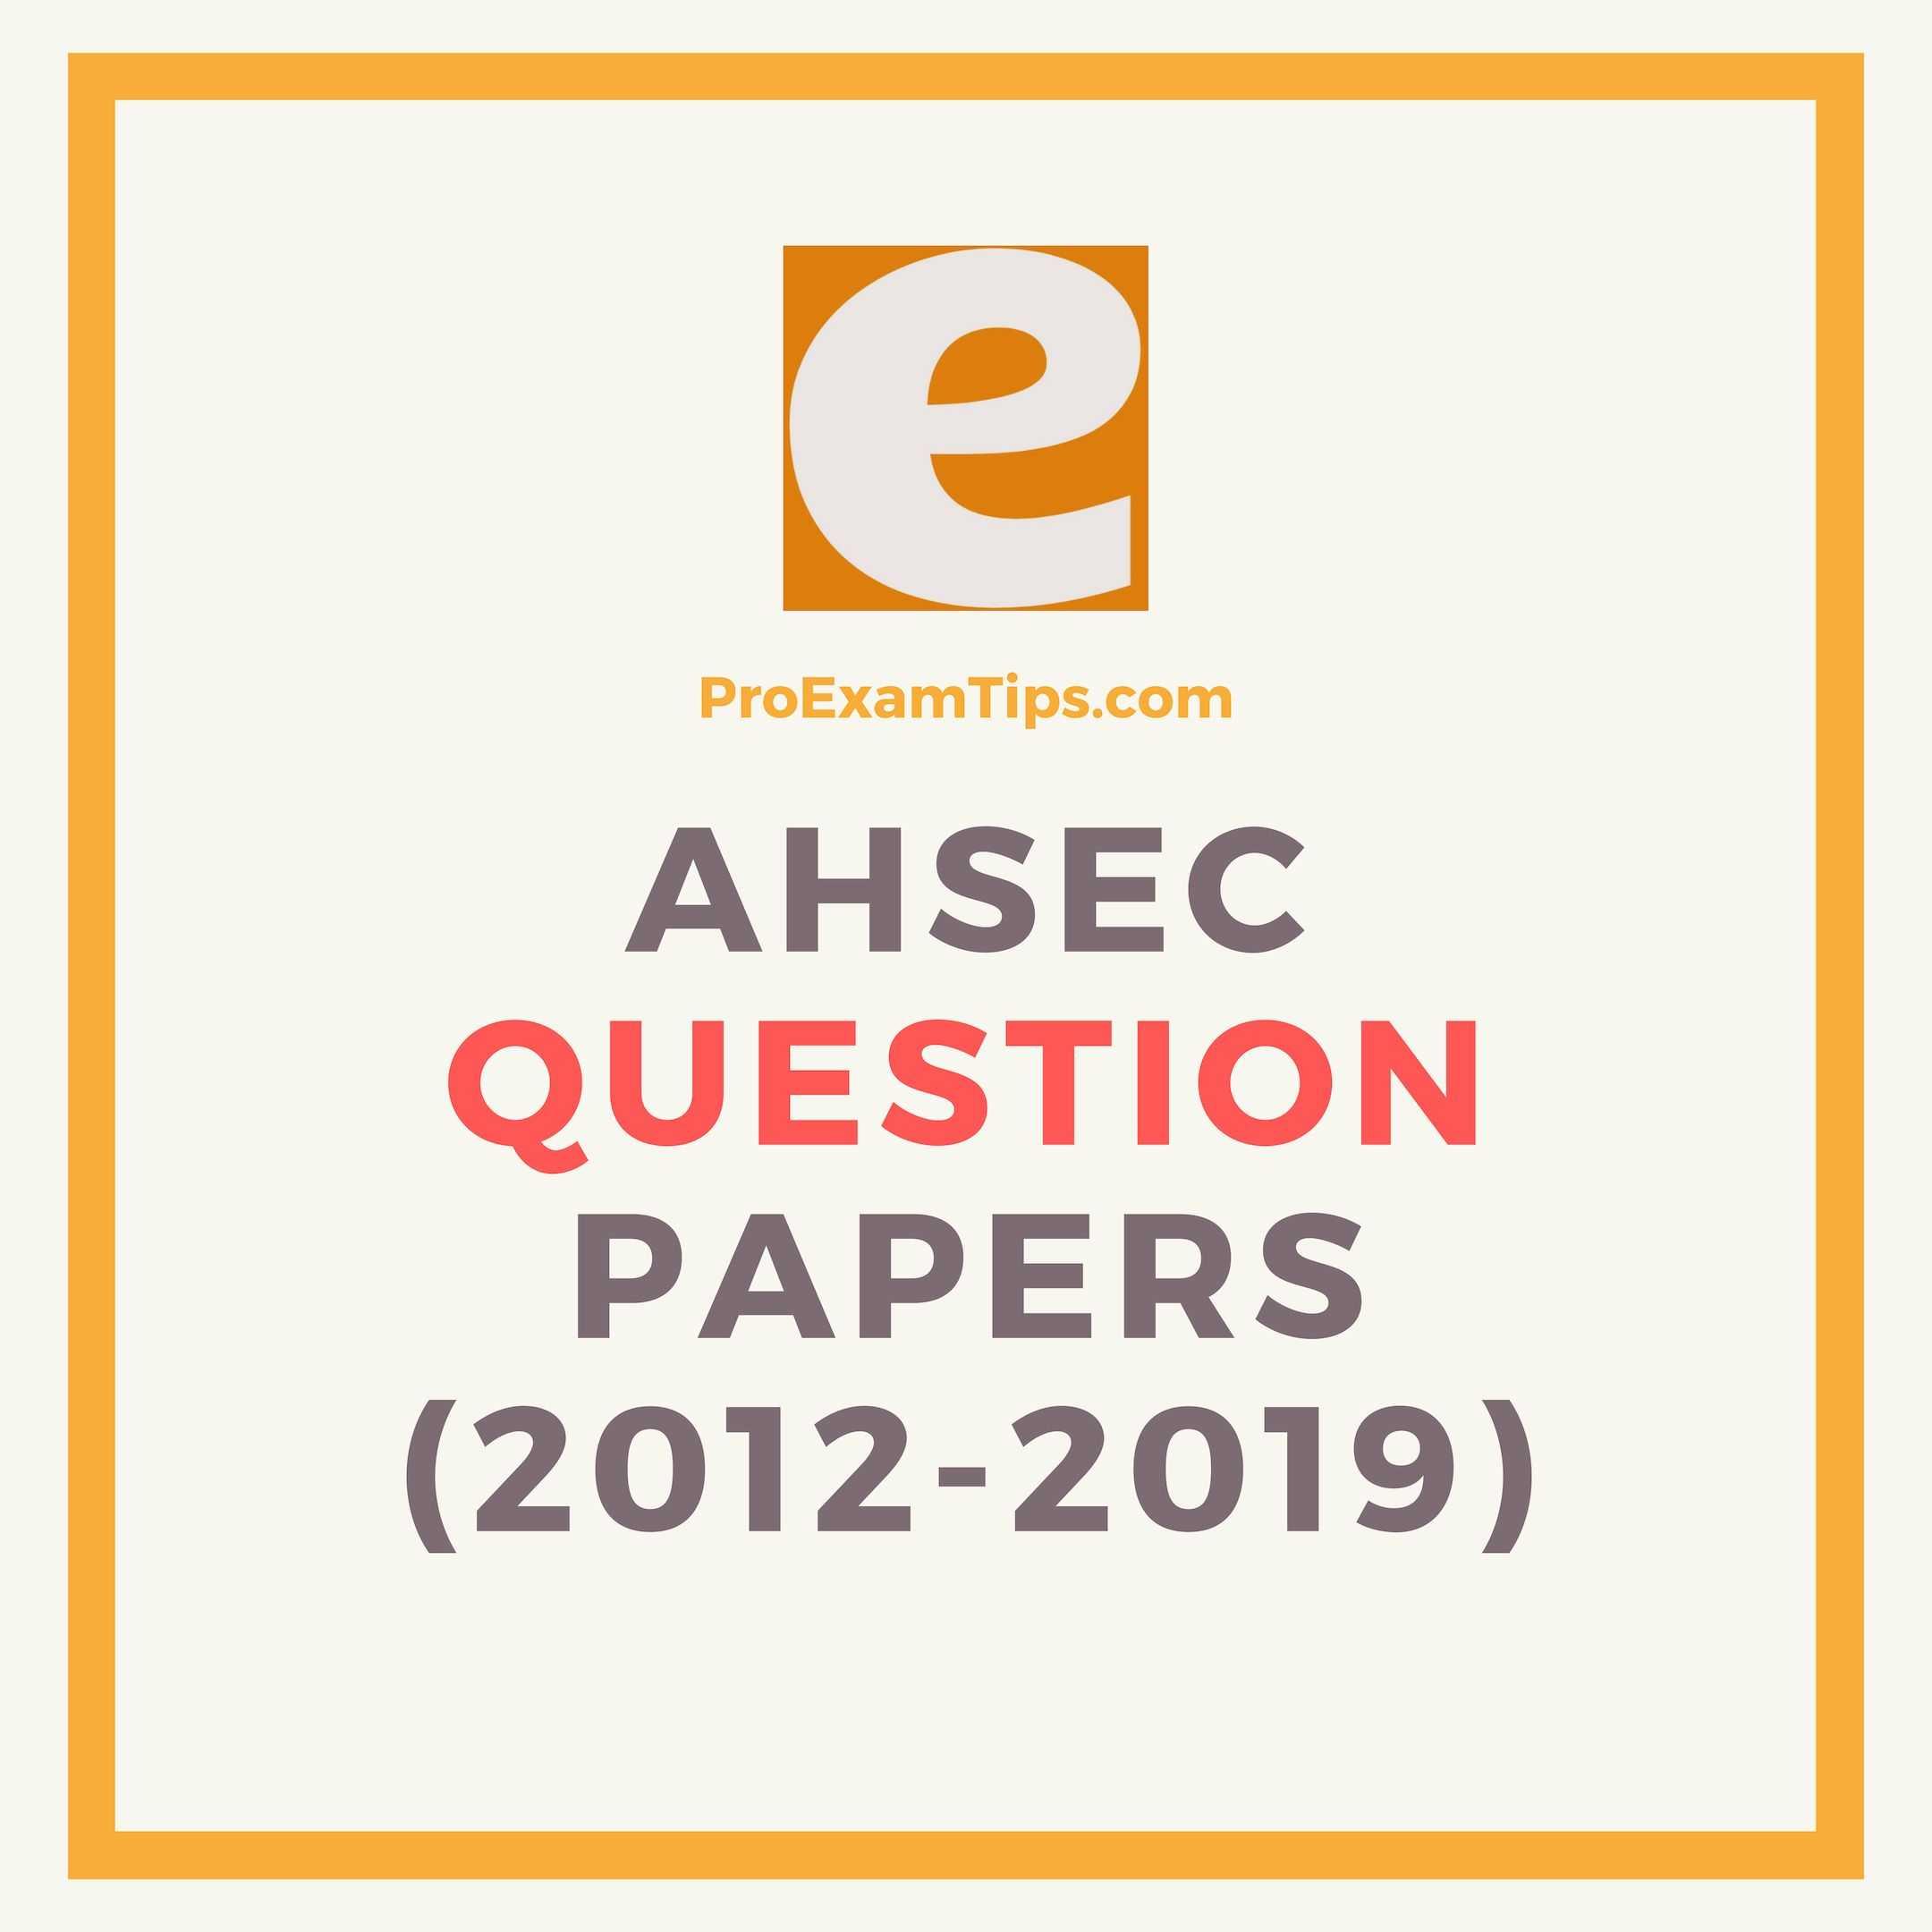 AHSEC Question Papers 2012-2019 (150 Nos) for Assam HS Exam